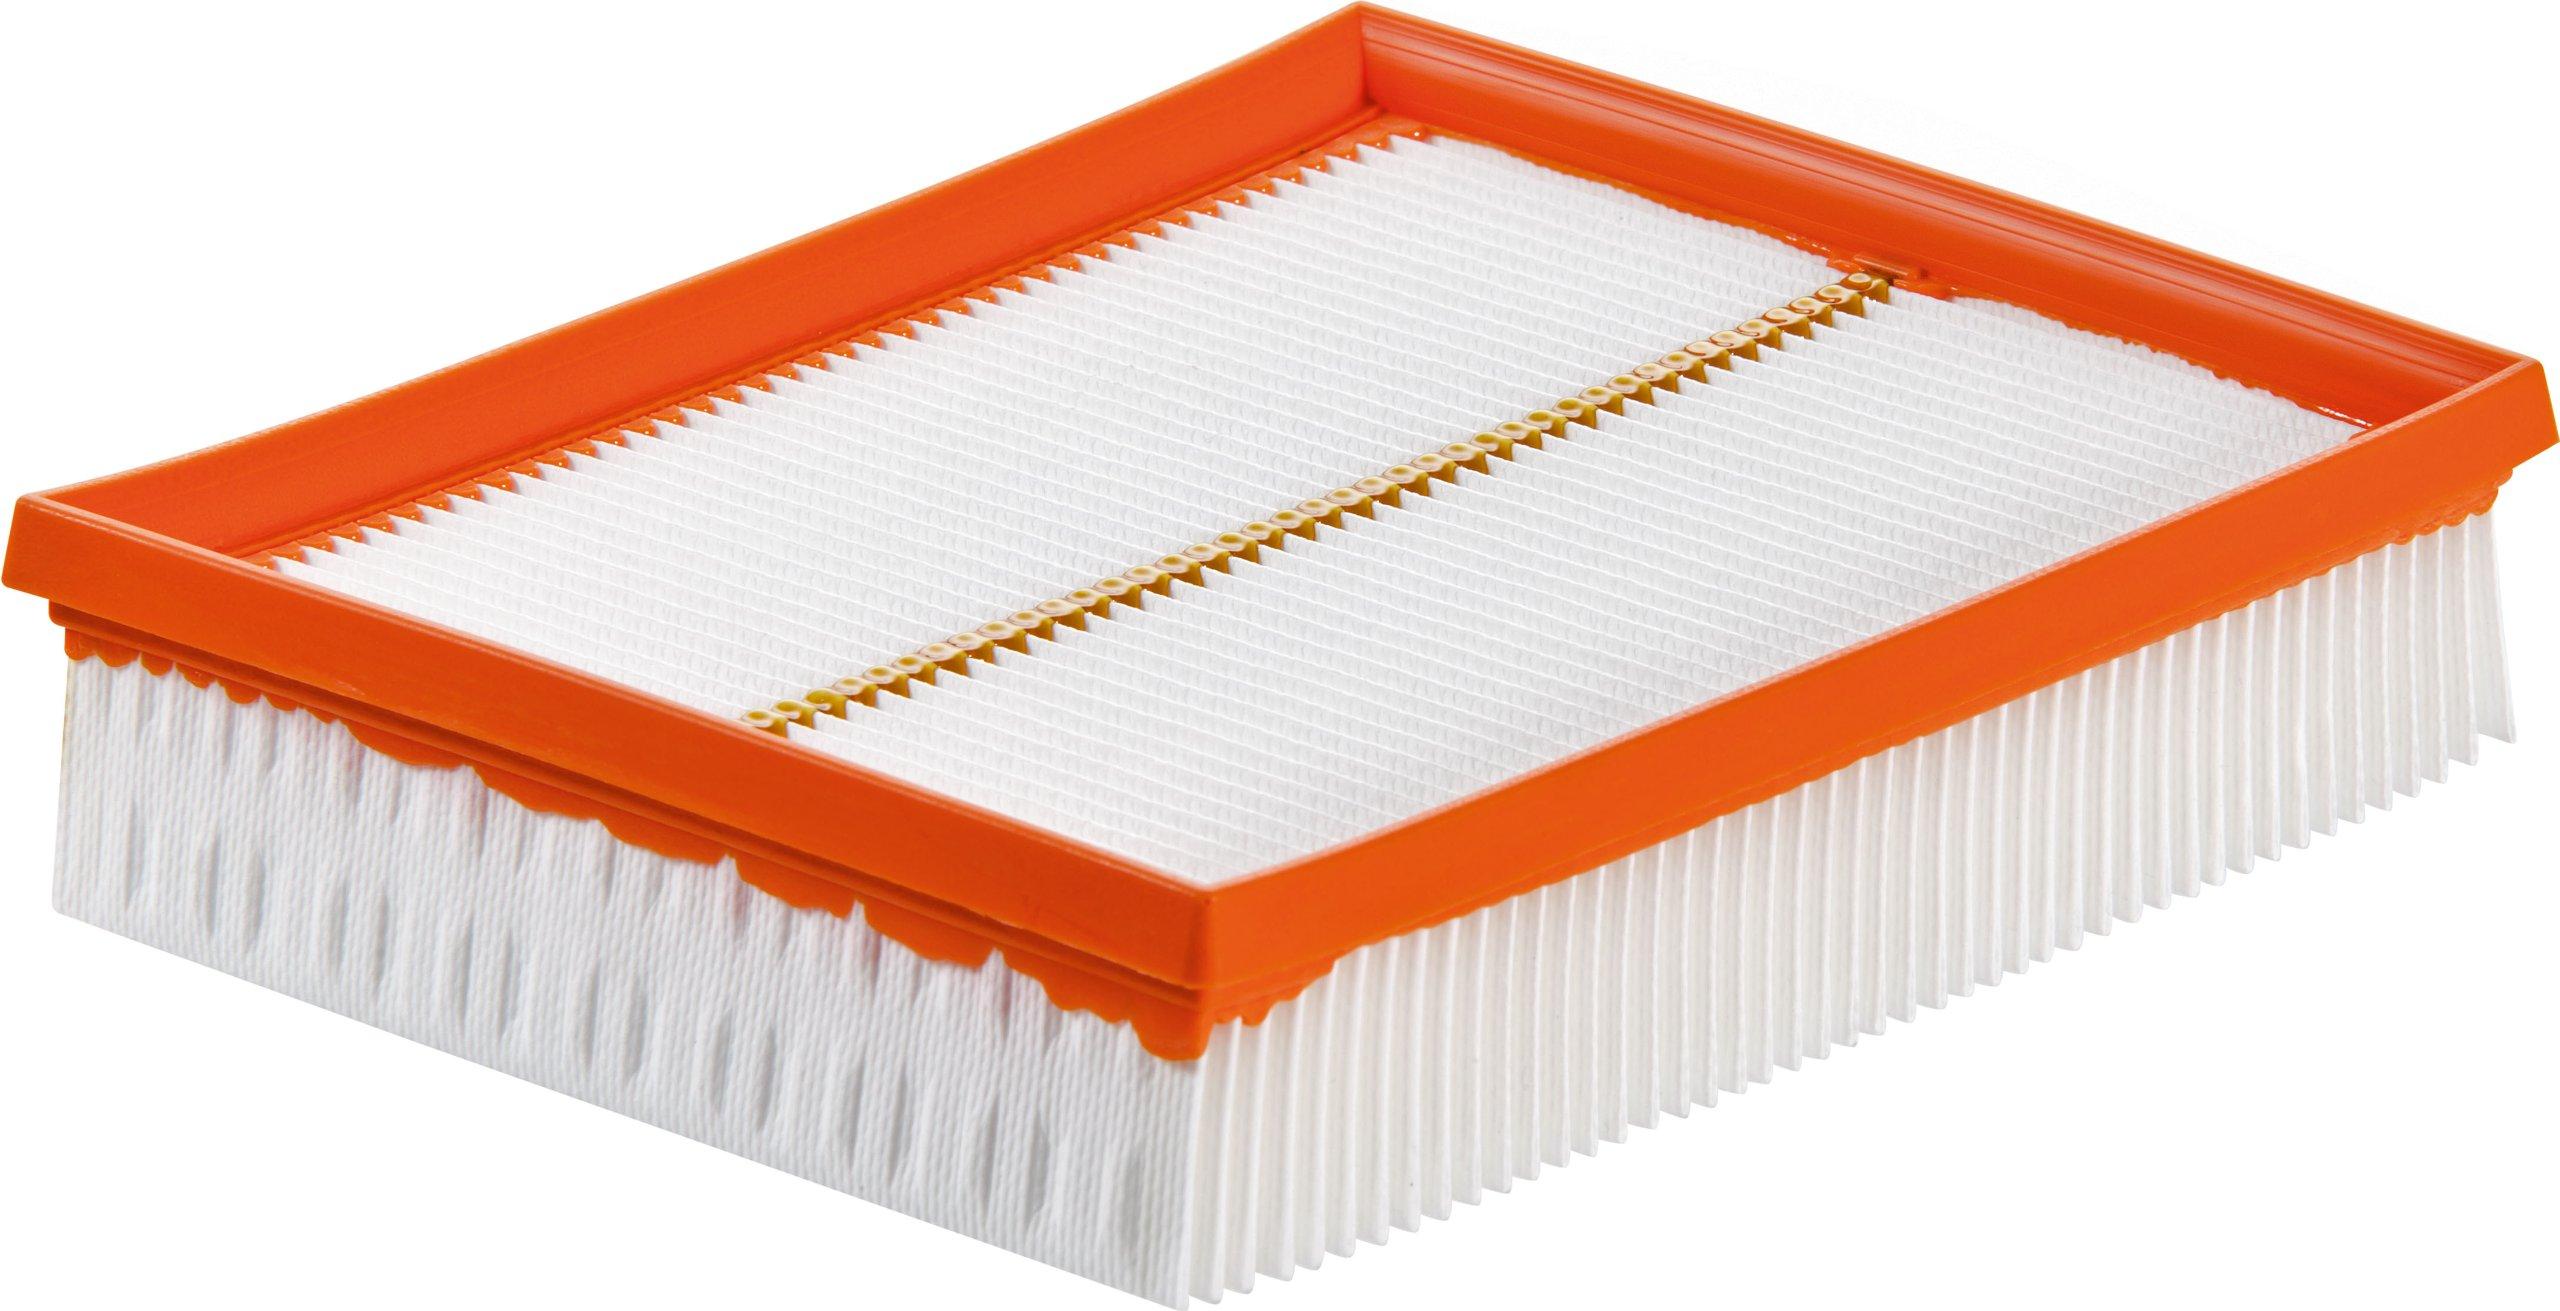 Festool 496172 High-Performance Filter